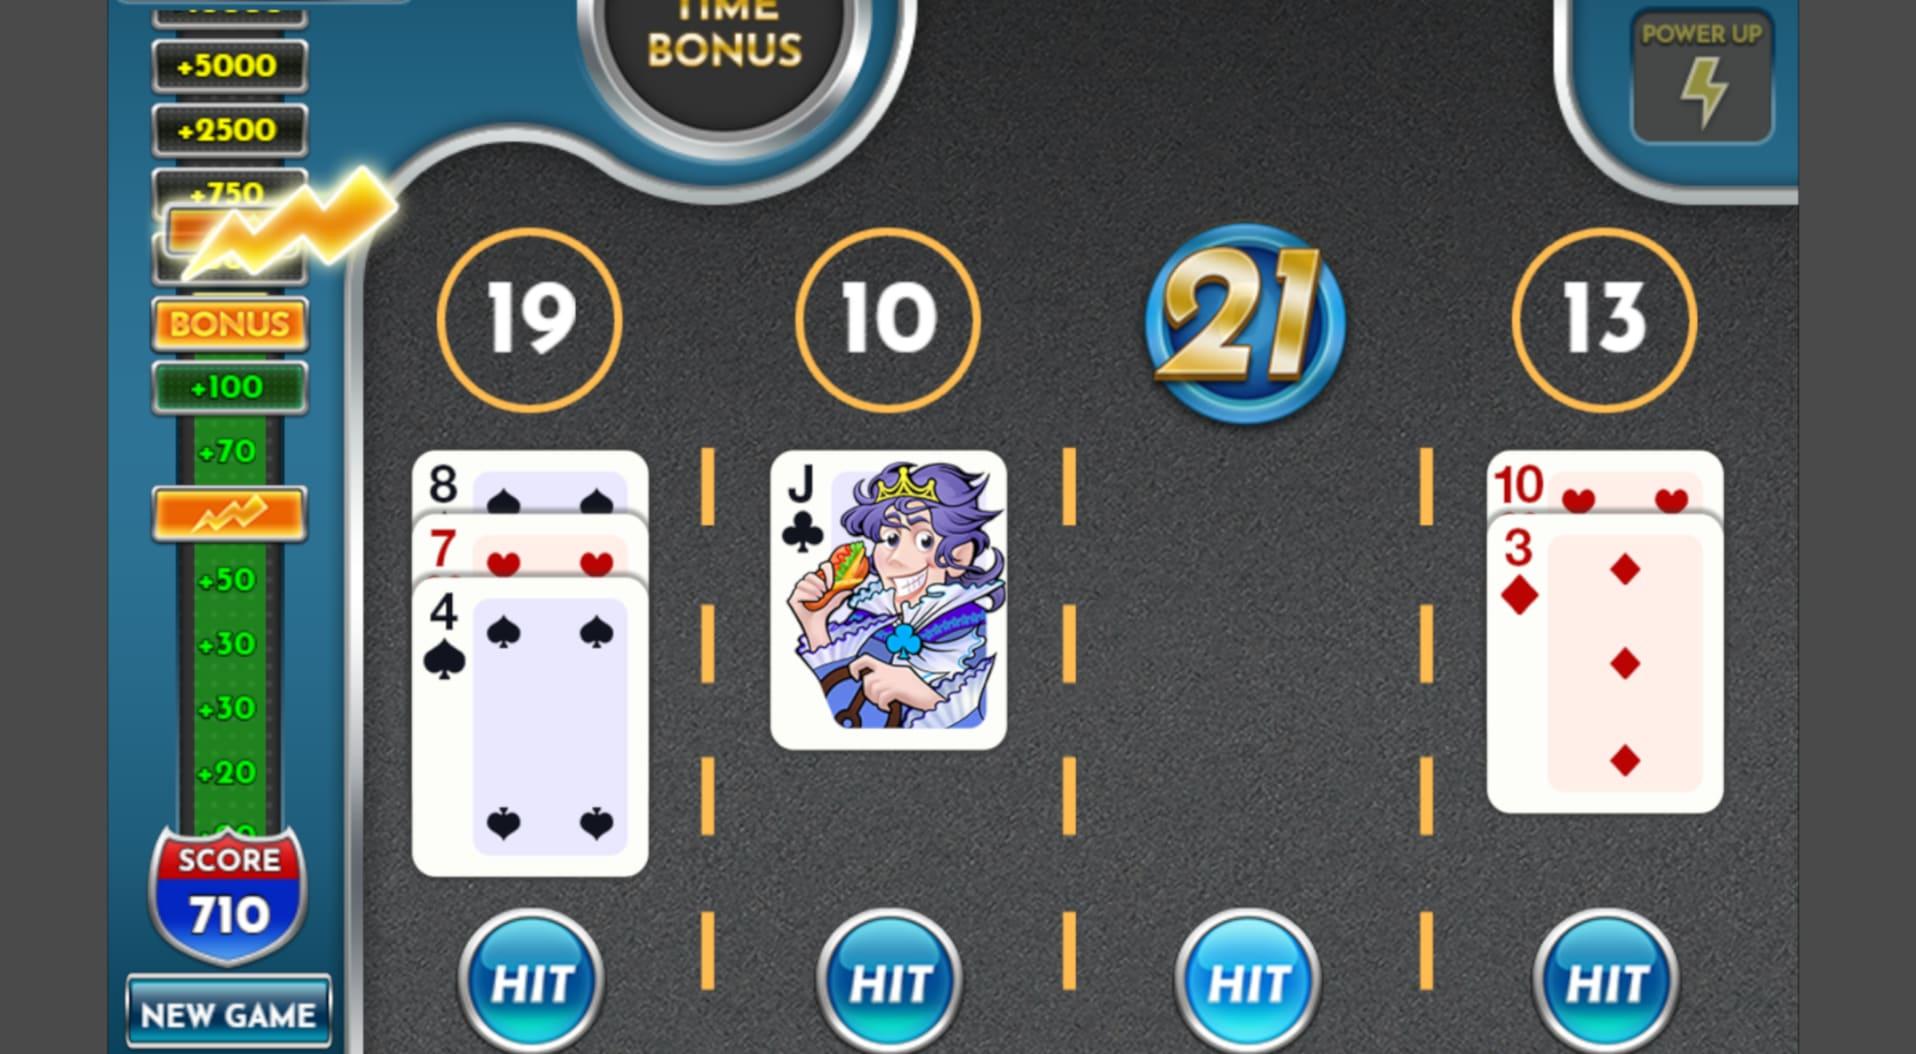 Blackjack ballroom casino play baccarat online for money